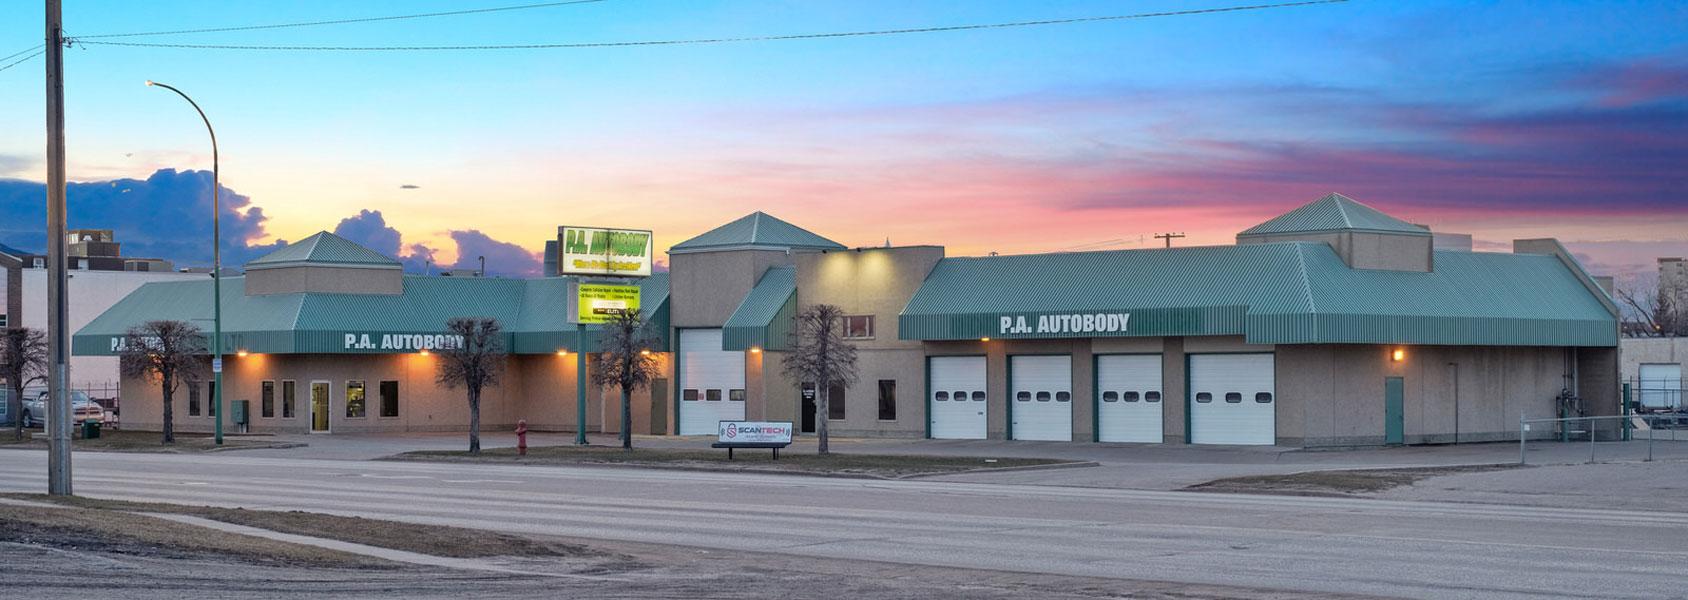 P. A. Autobody Shop